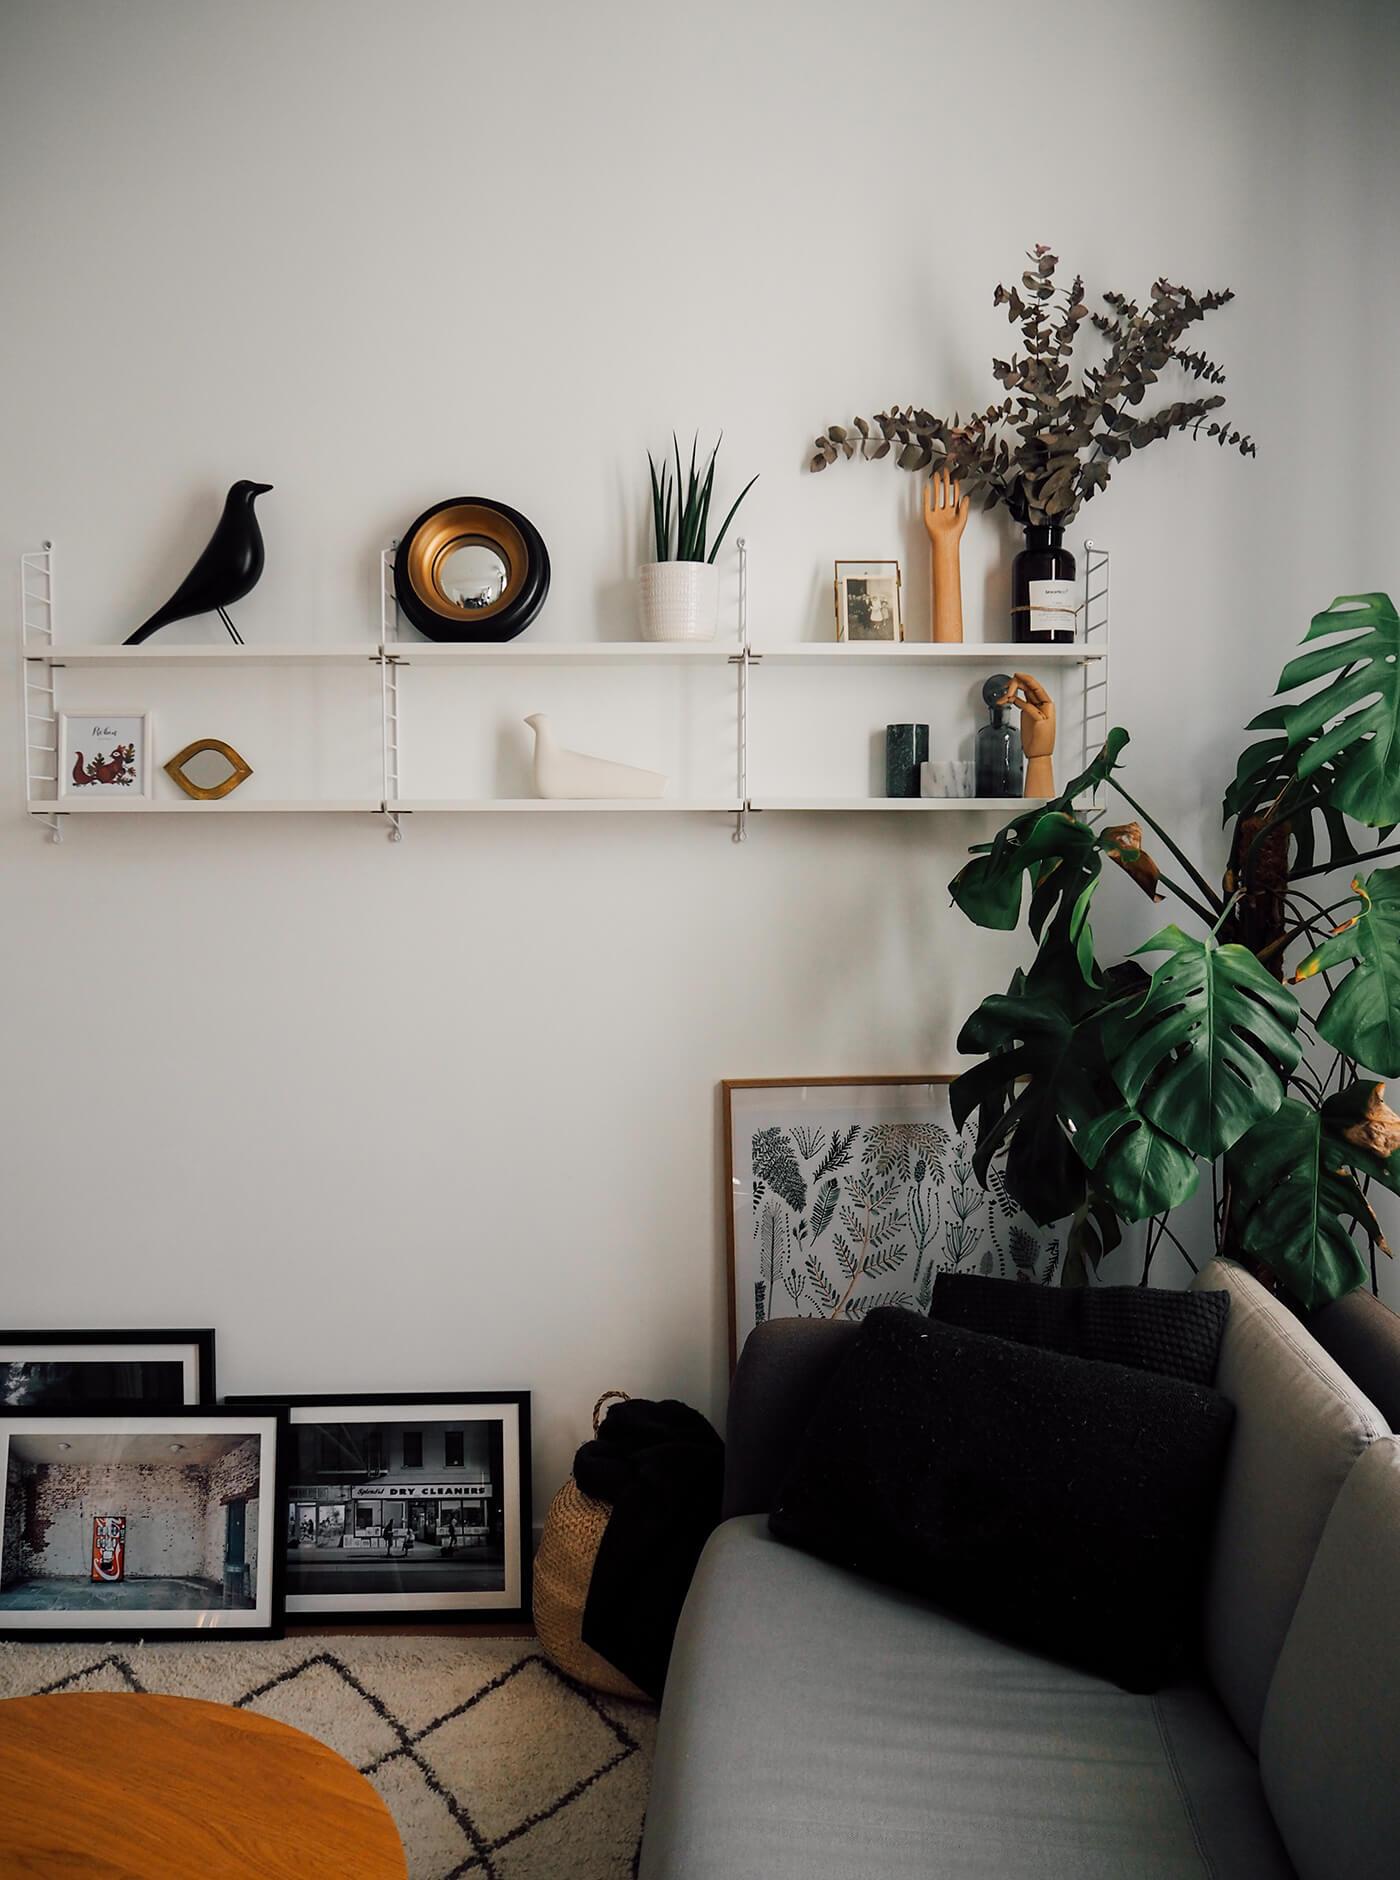 interieur decoration cosy enfant vie famille 7 frenchyfancy 8 frenchy fancy. Black Bedroom Furniture Sets. Home Design Ideas